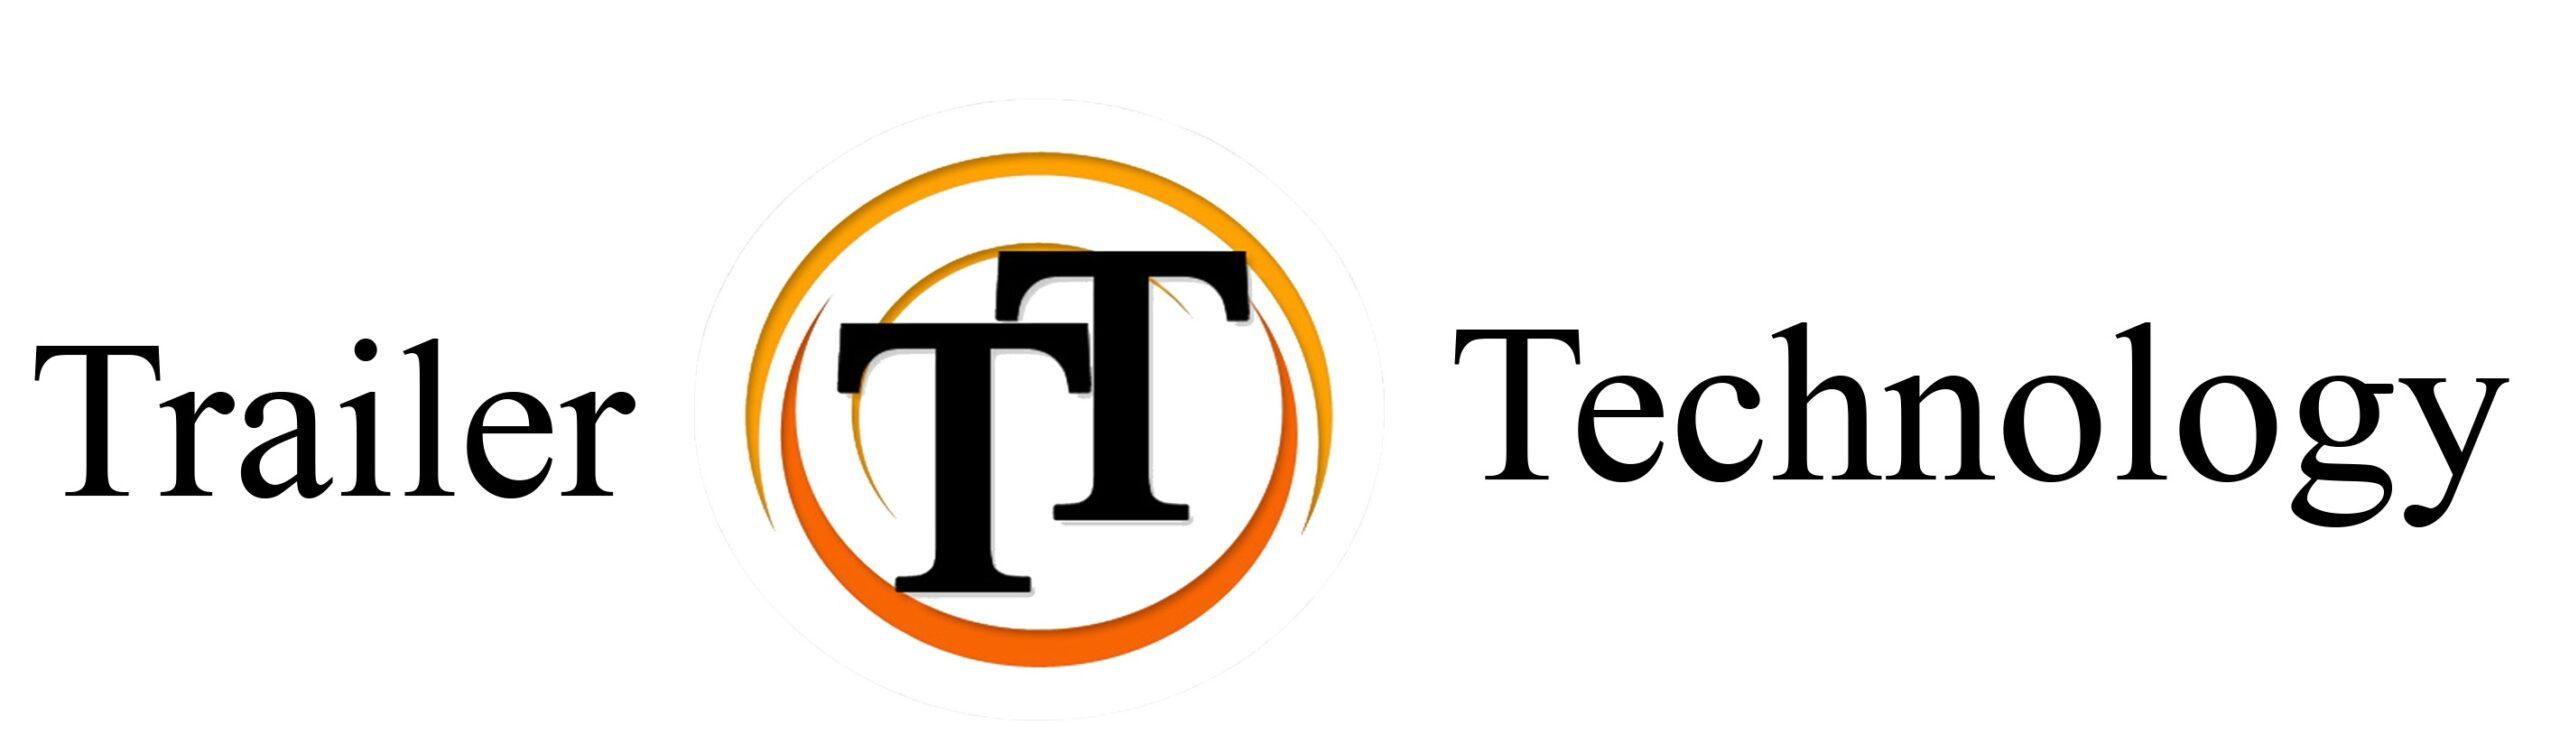 Логотип Trailer Technology